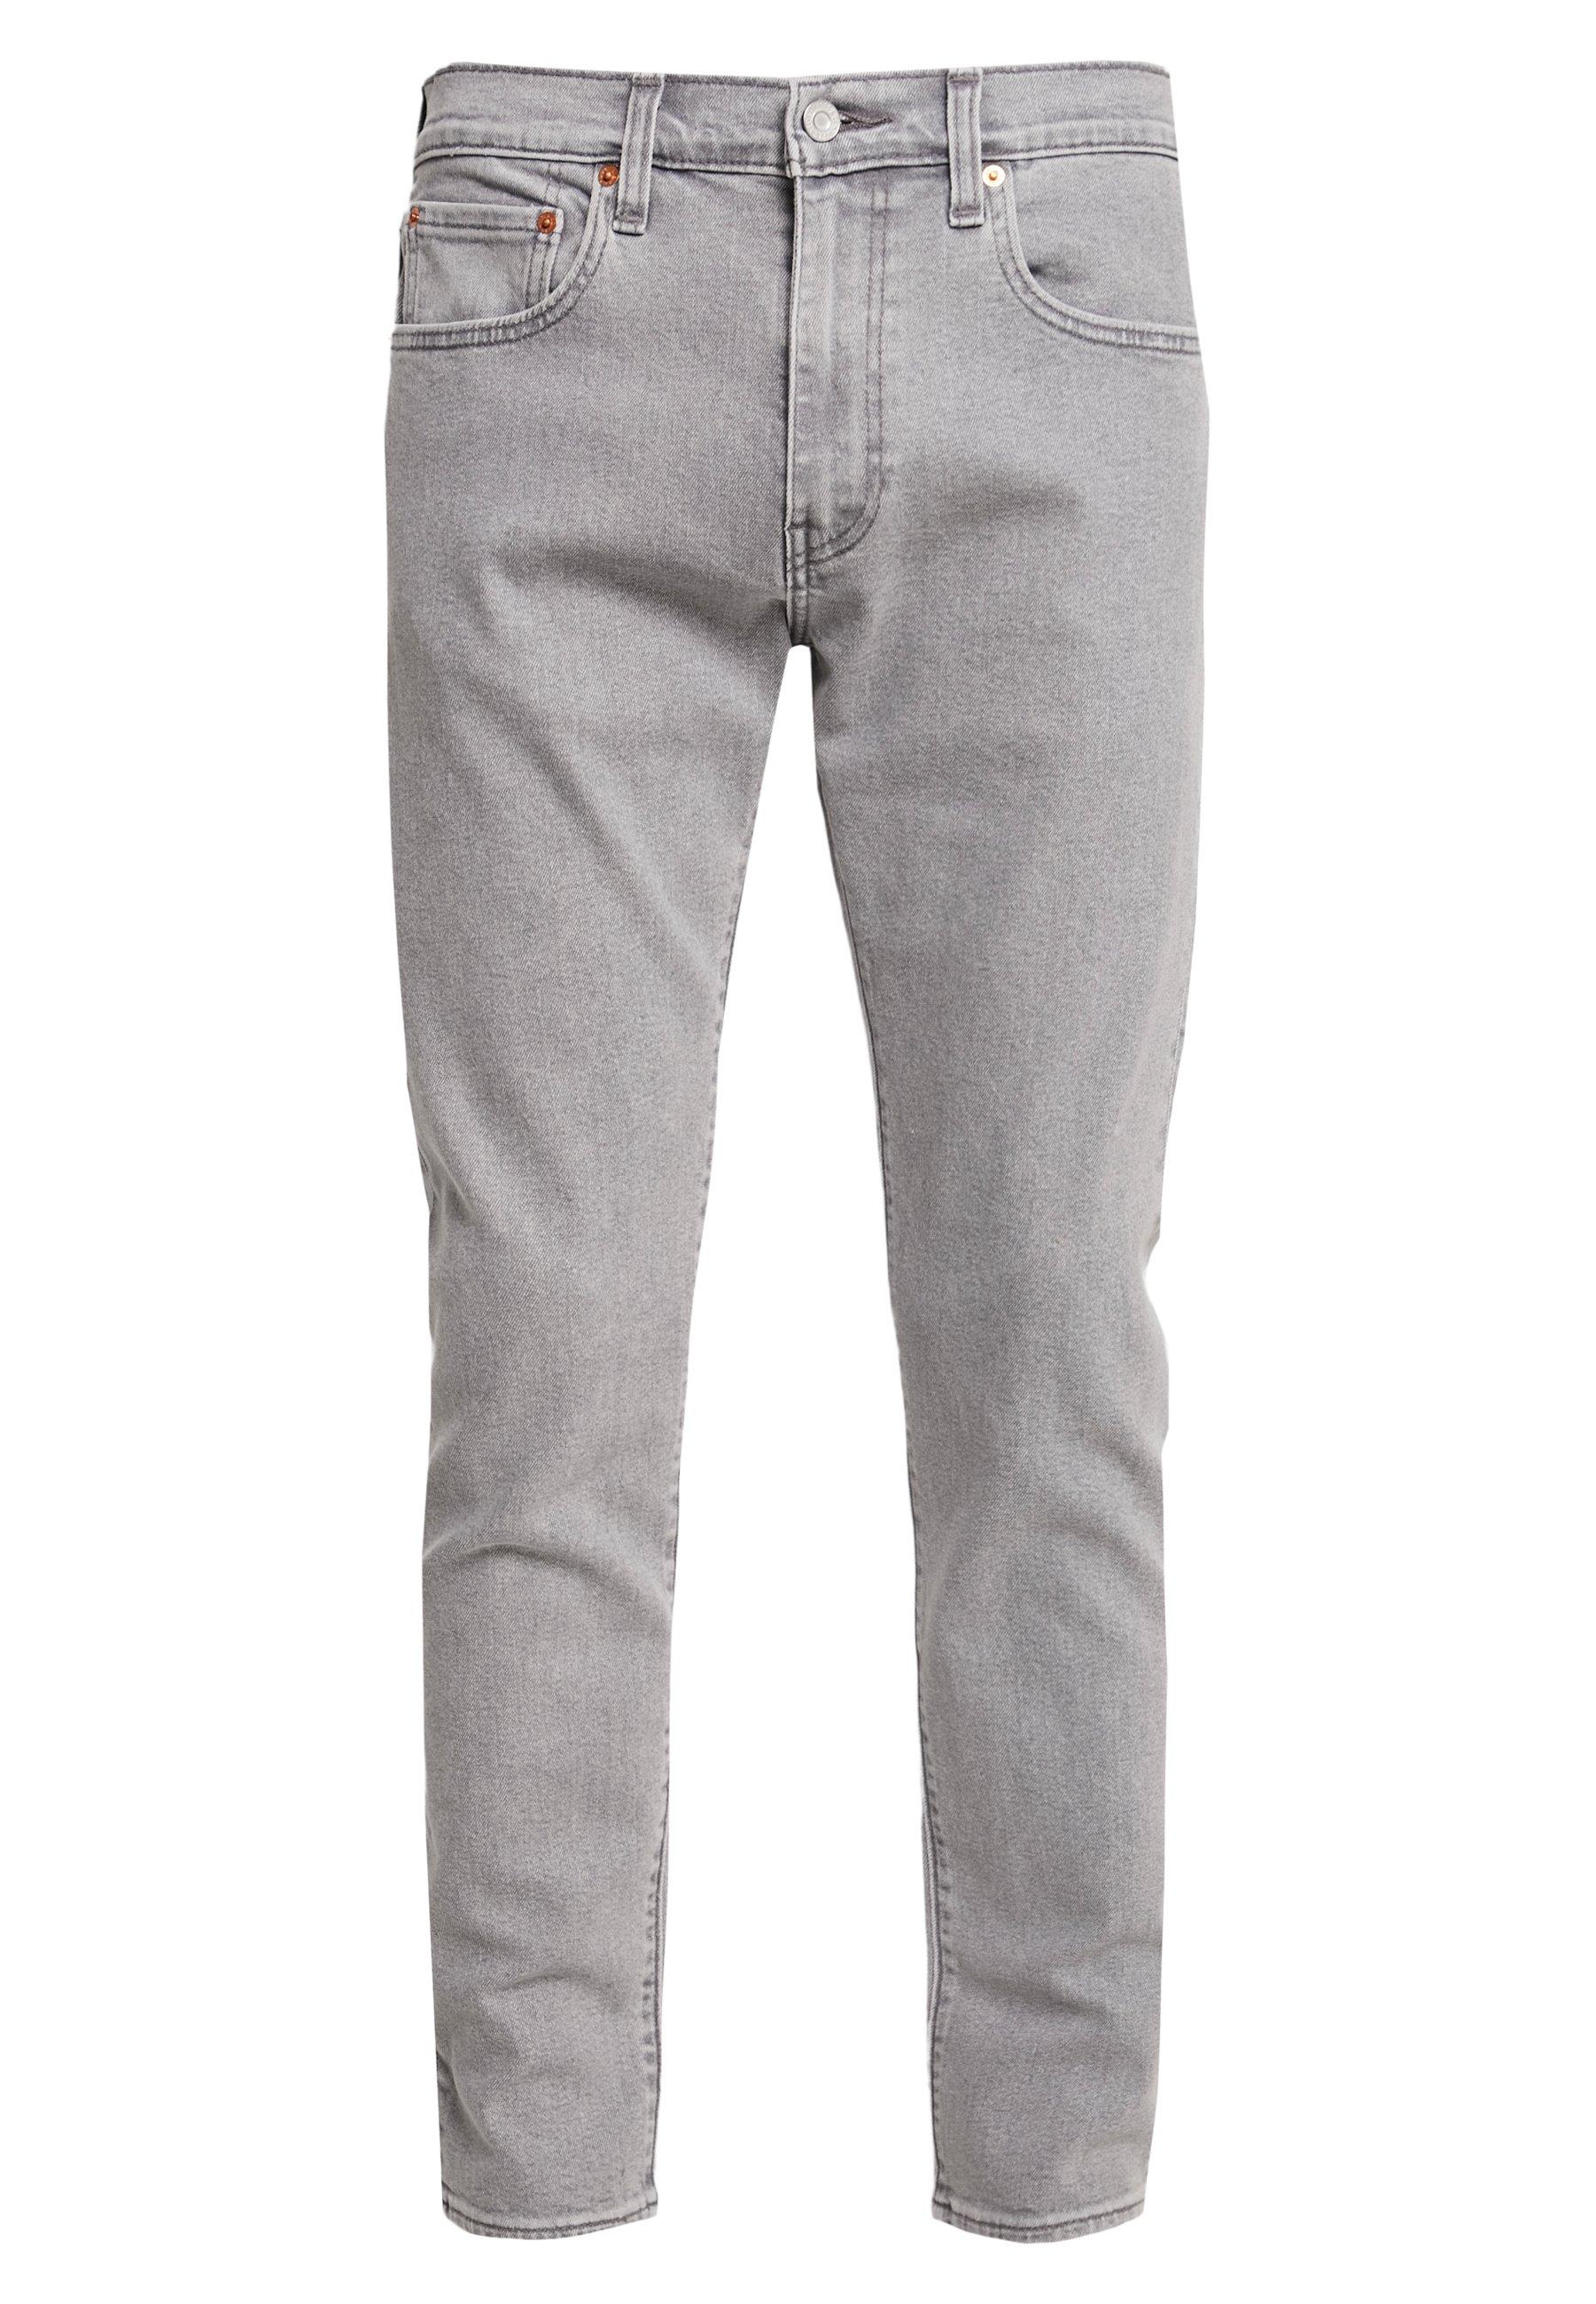 512™ SLIM TAPER FIT Jeans slim fit steel grey stonewash